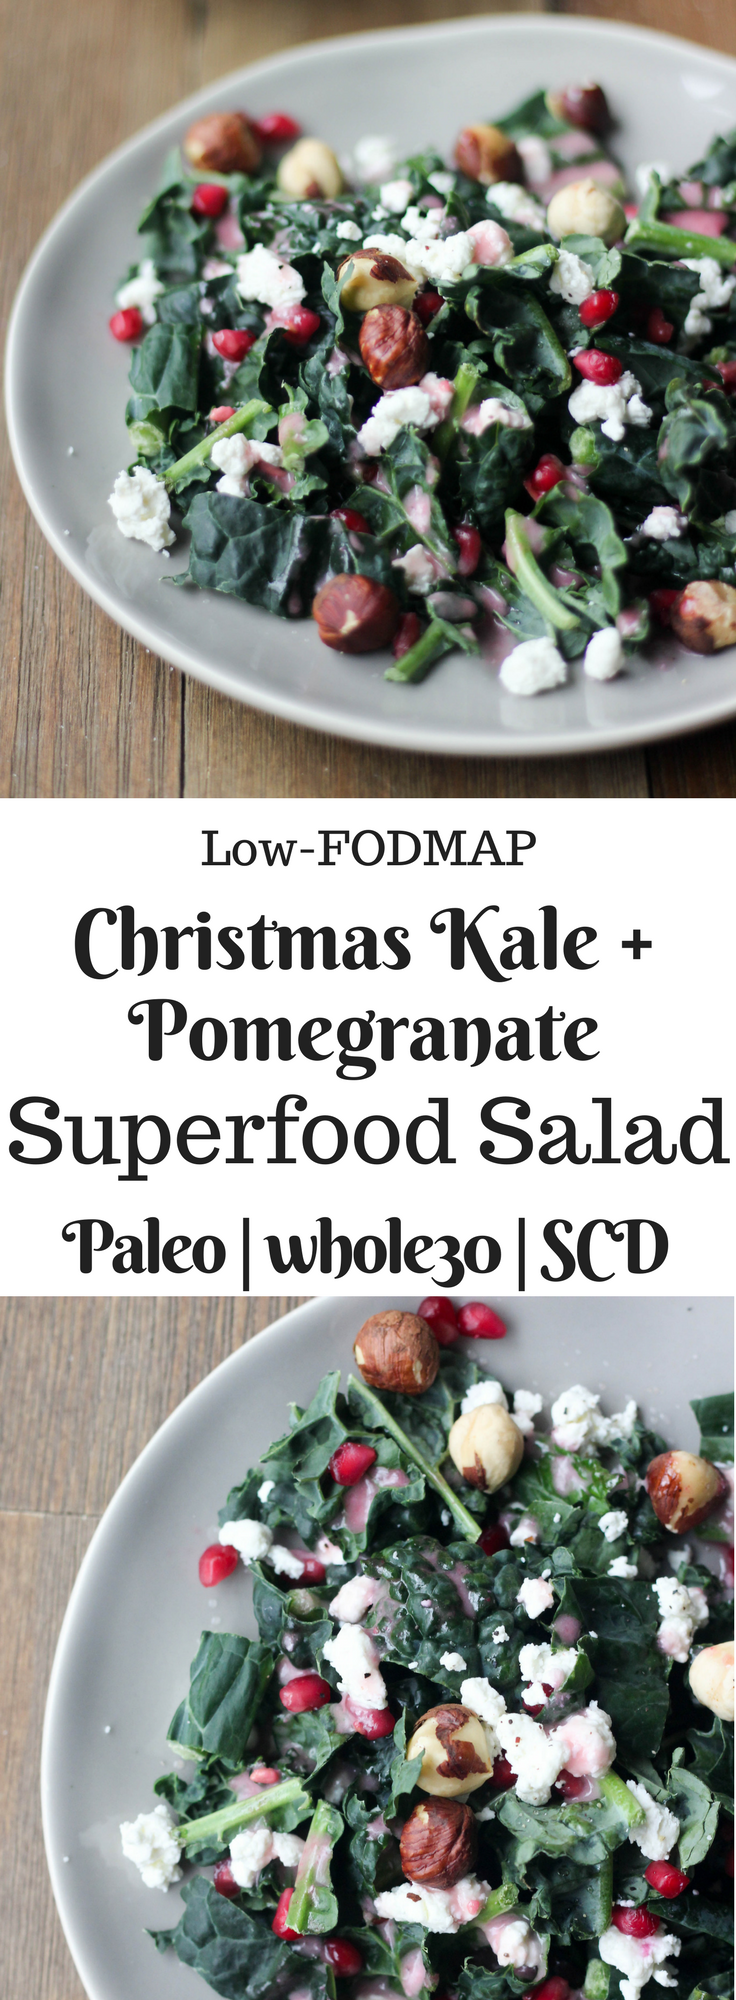 healthy-paleo-superfood-kale-pomegranate-salad-whole30